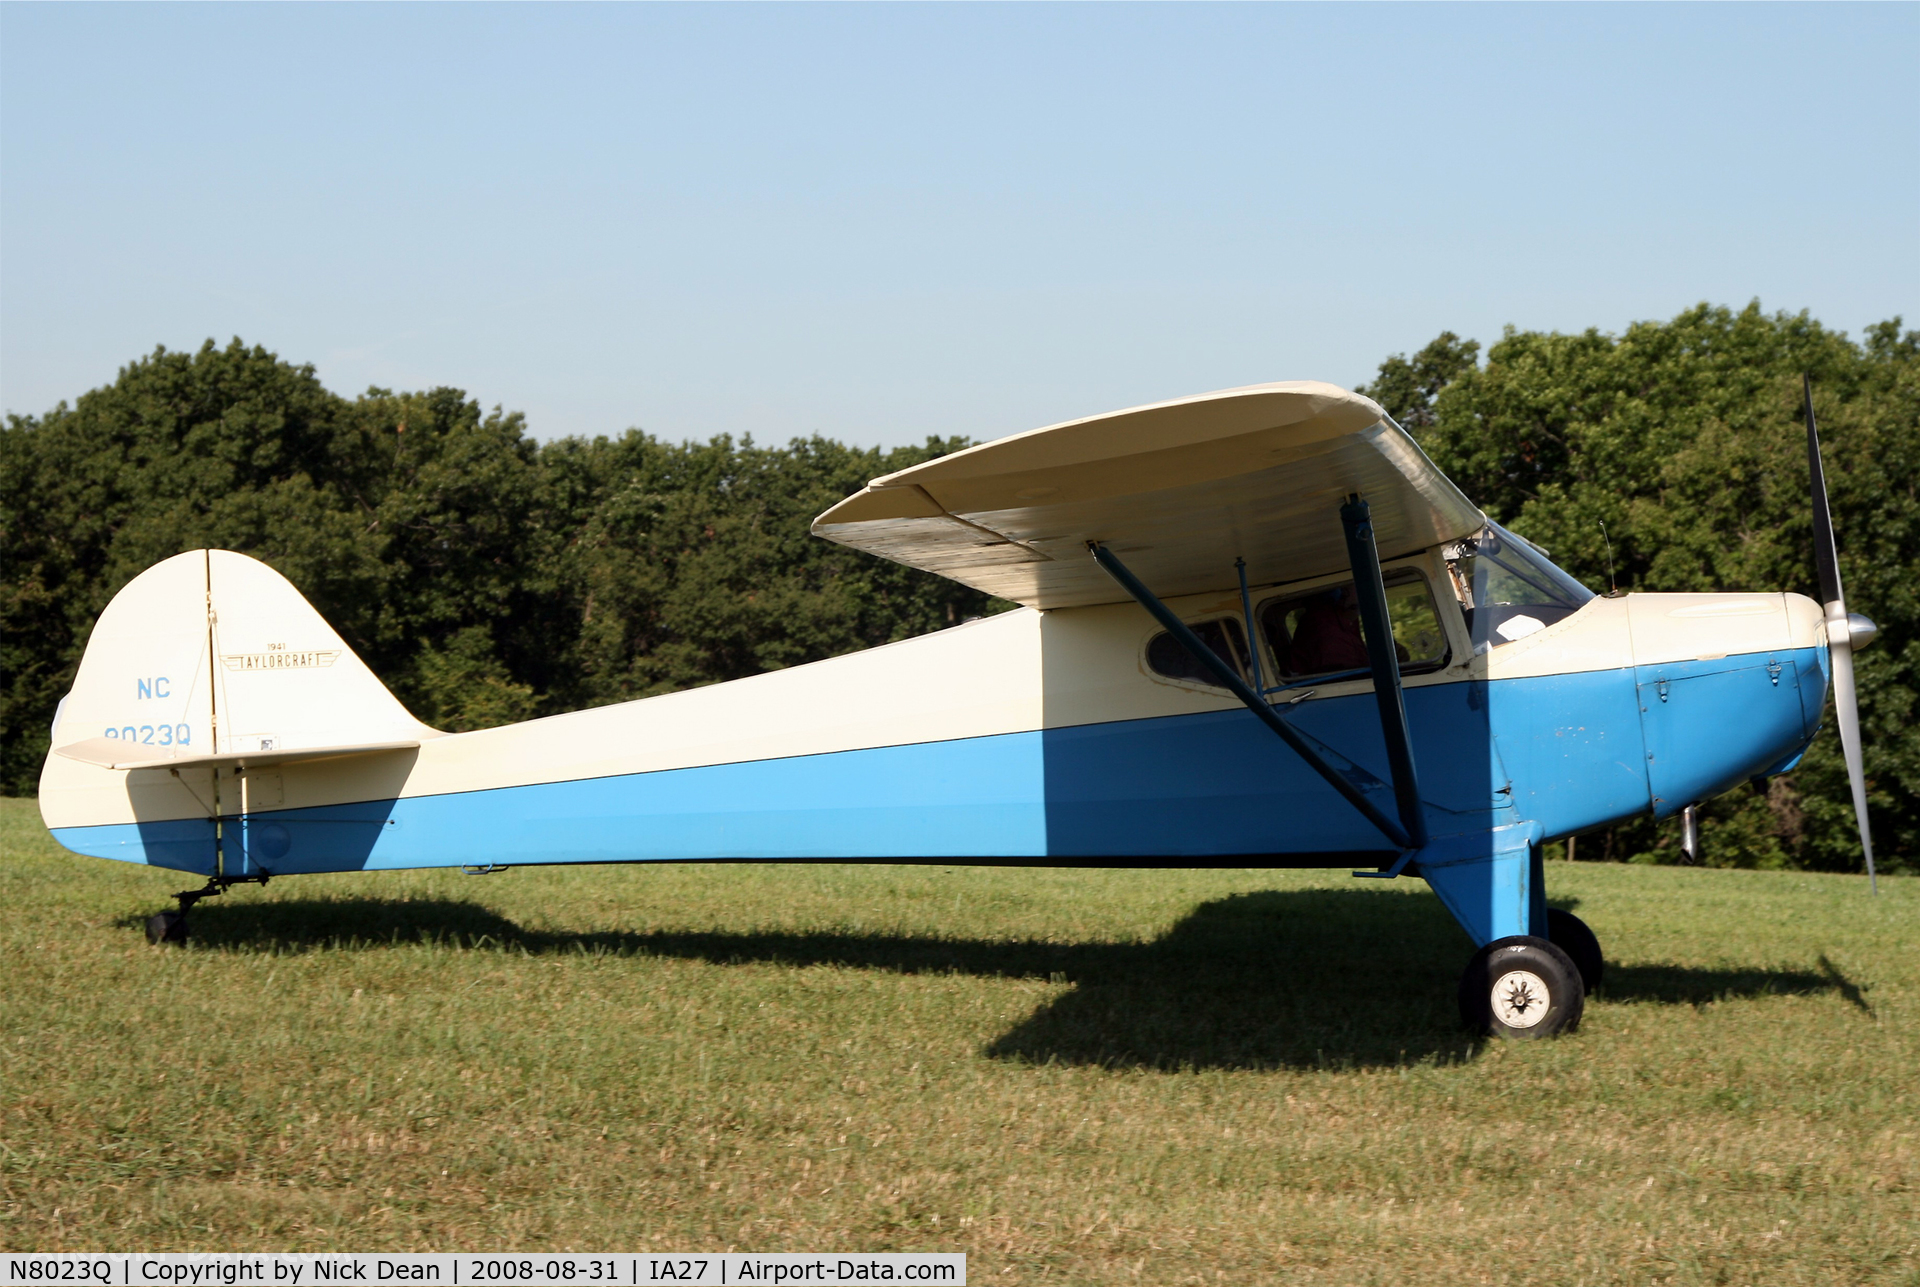 N8023Q, Taylorcraft BCS-65 C/N 3135, /